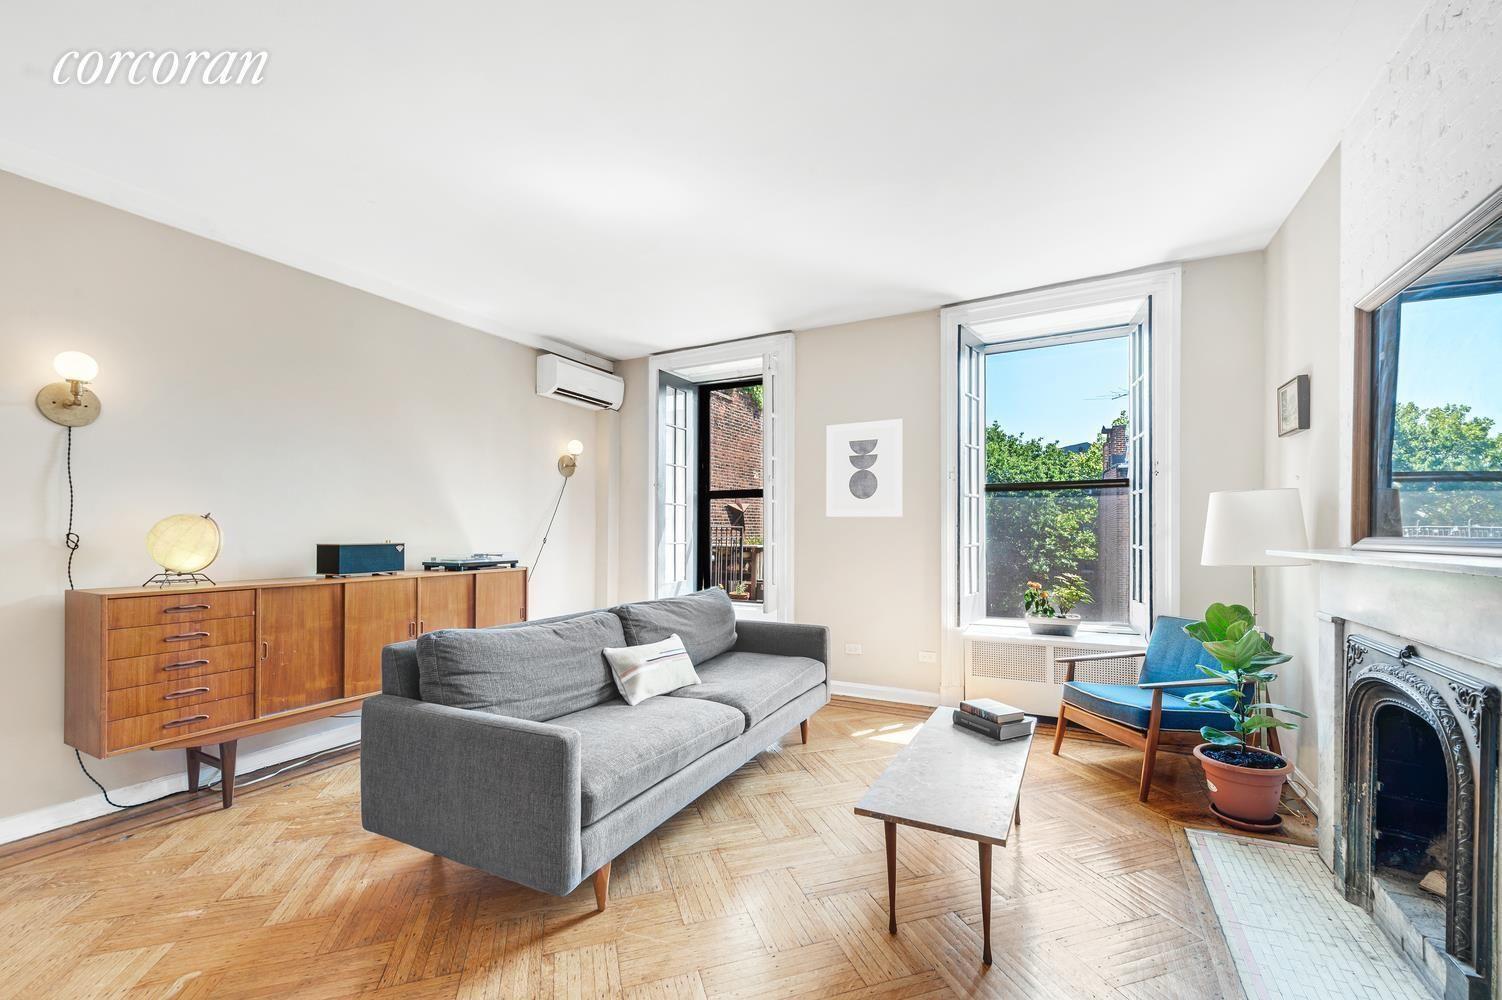 Apartment for sale at 30 Remsen Street, Apt 3b